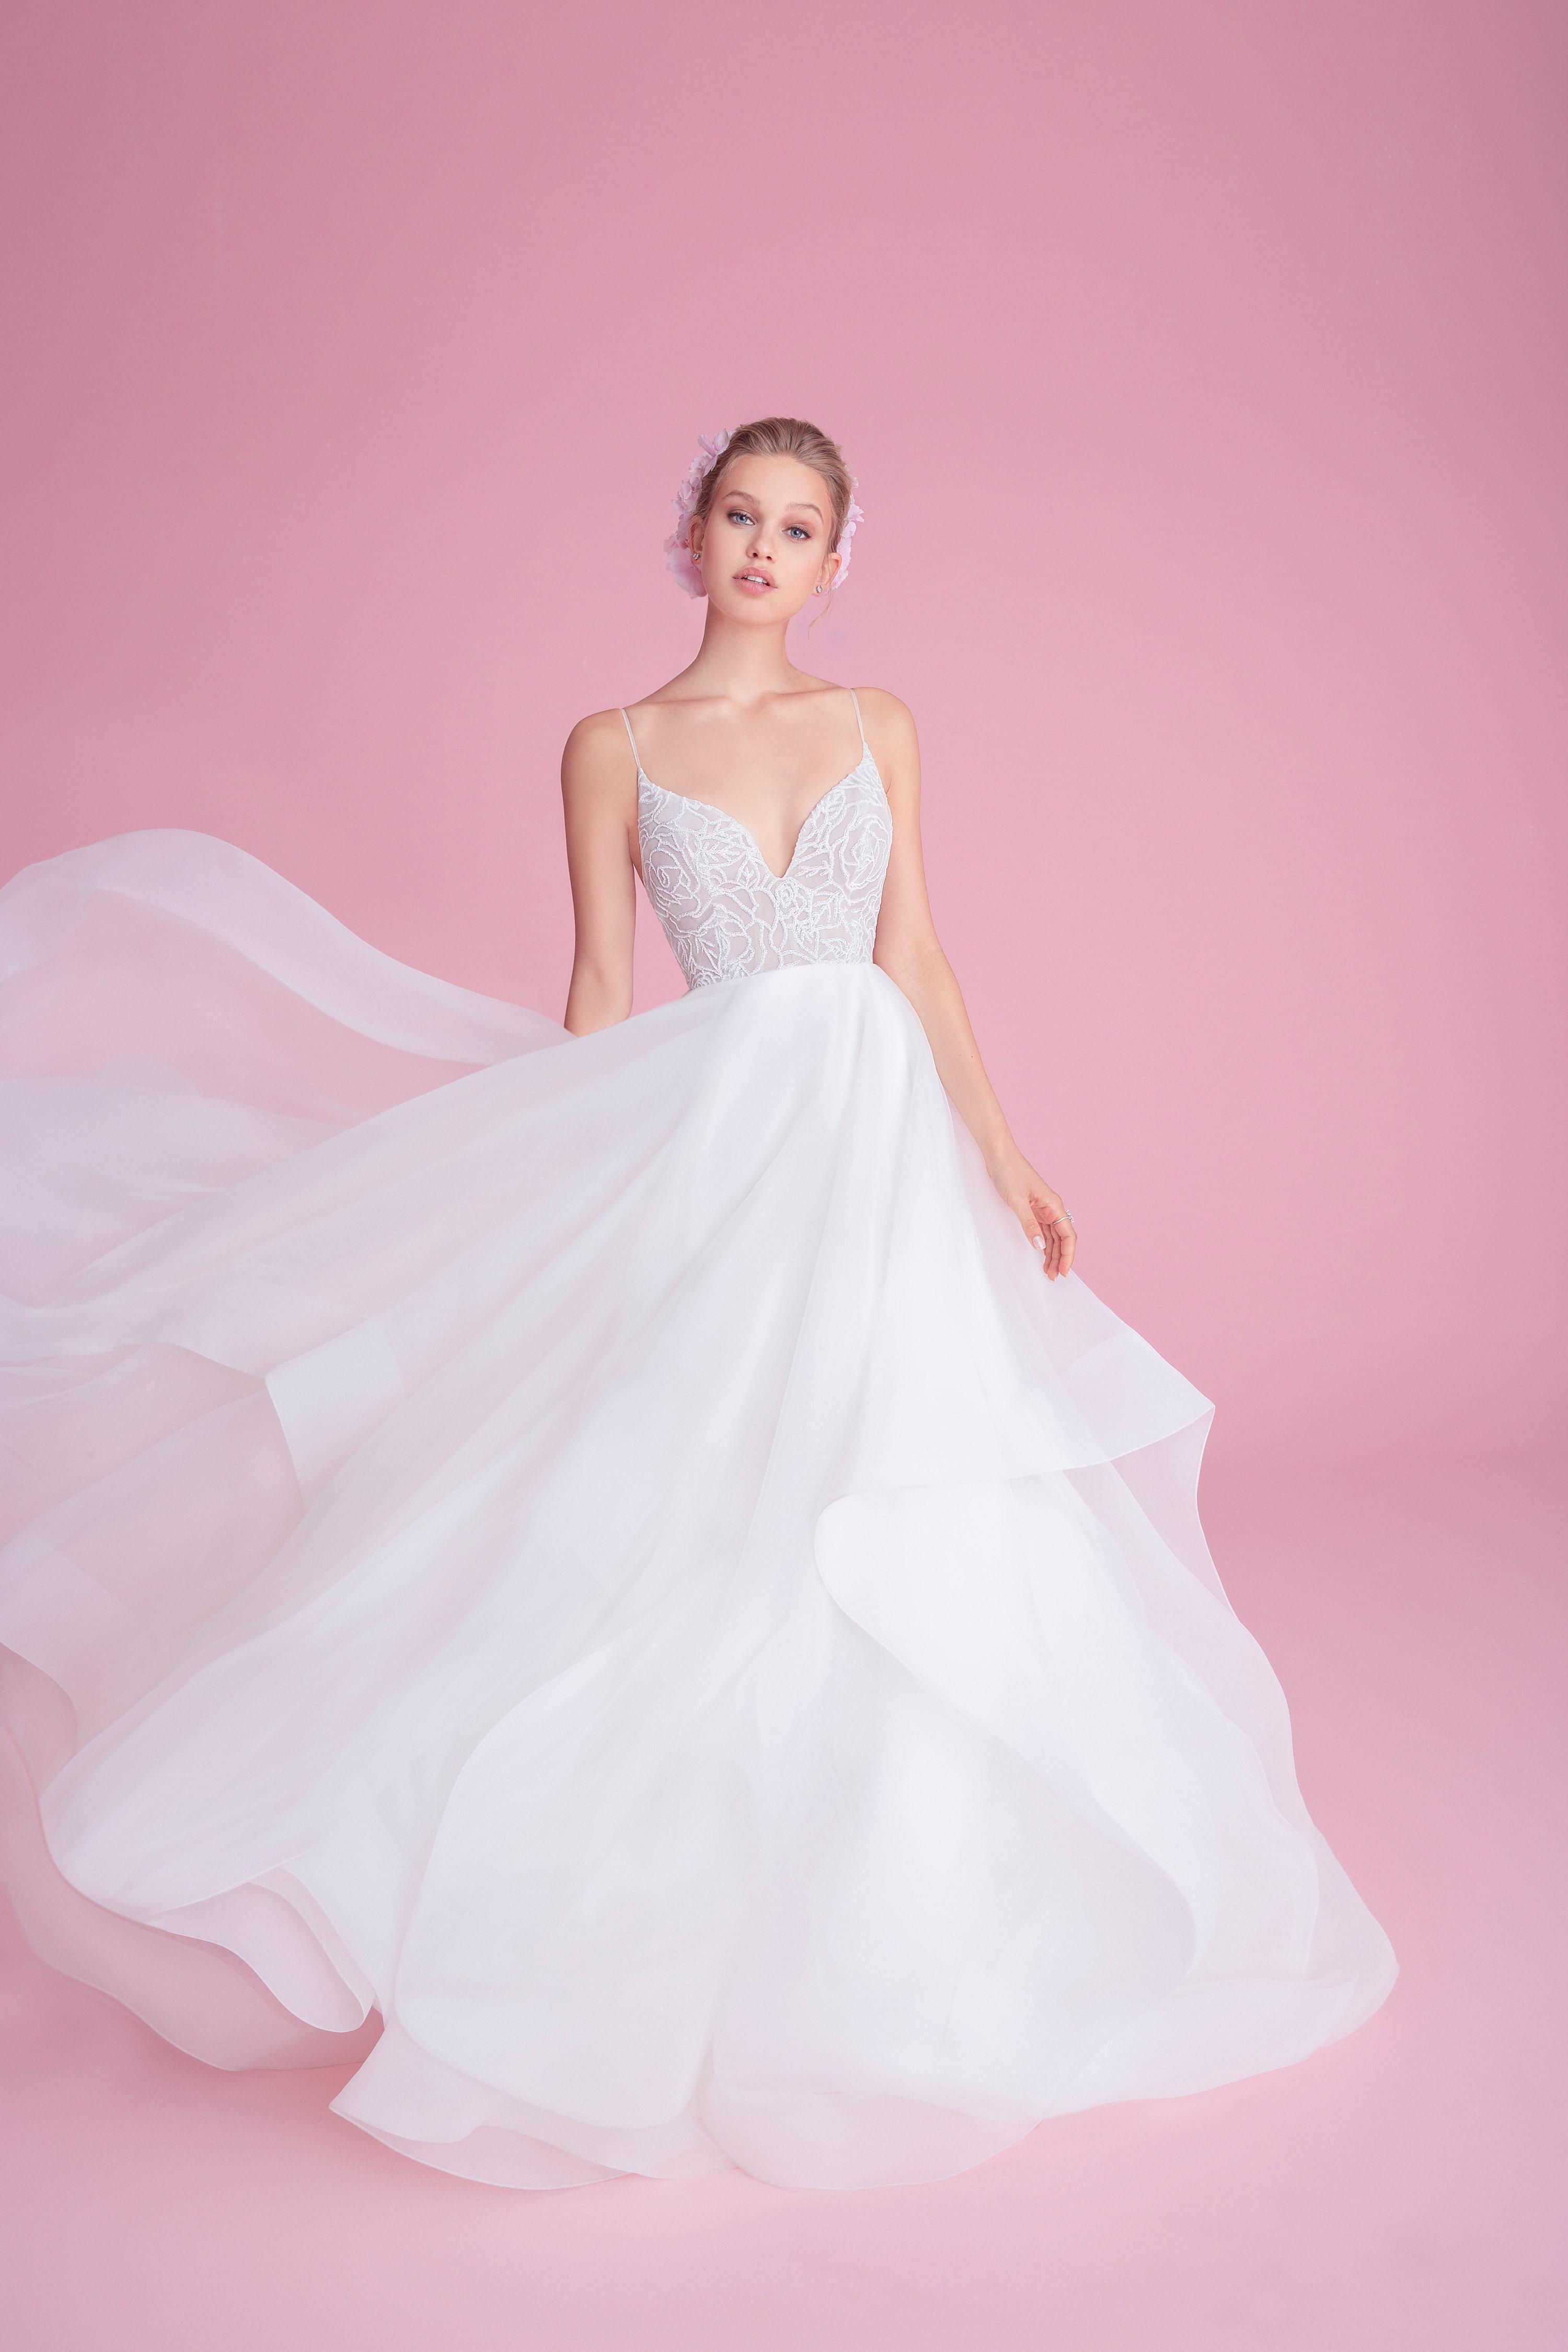 8c8f721ff374 Blush by Hayley Paige - Annalise Bridal Boutique : Annalise Bridal ...